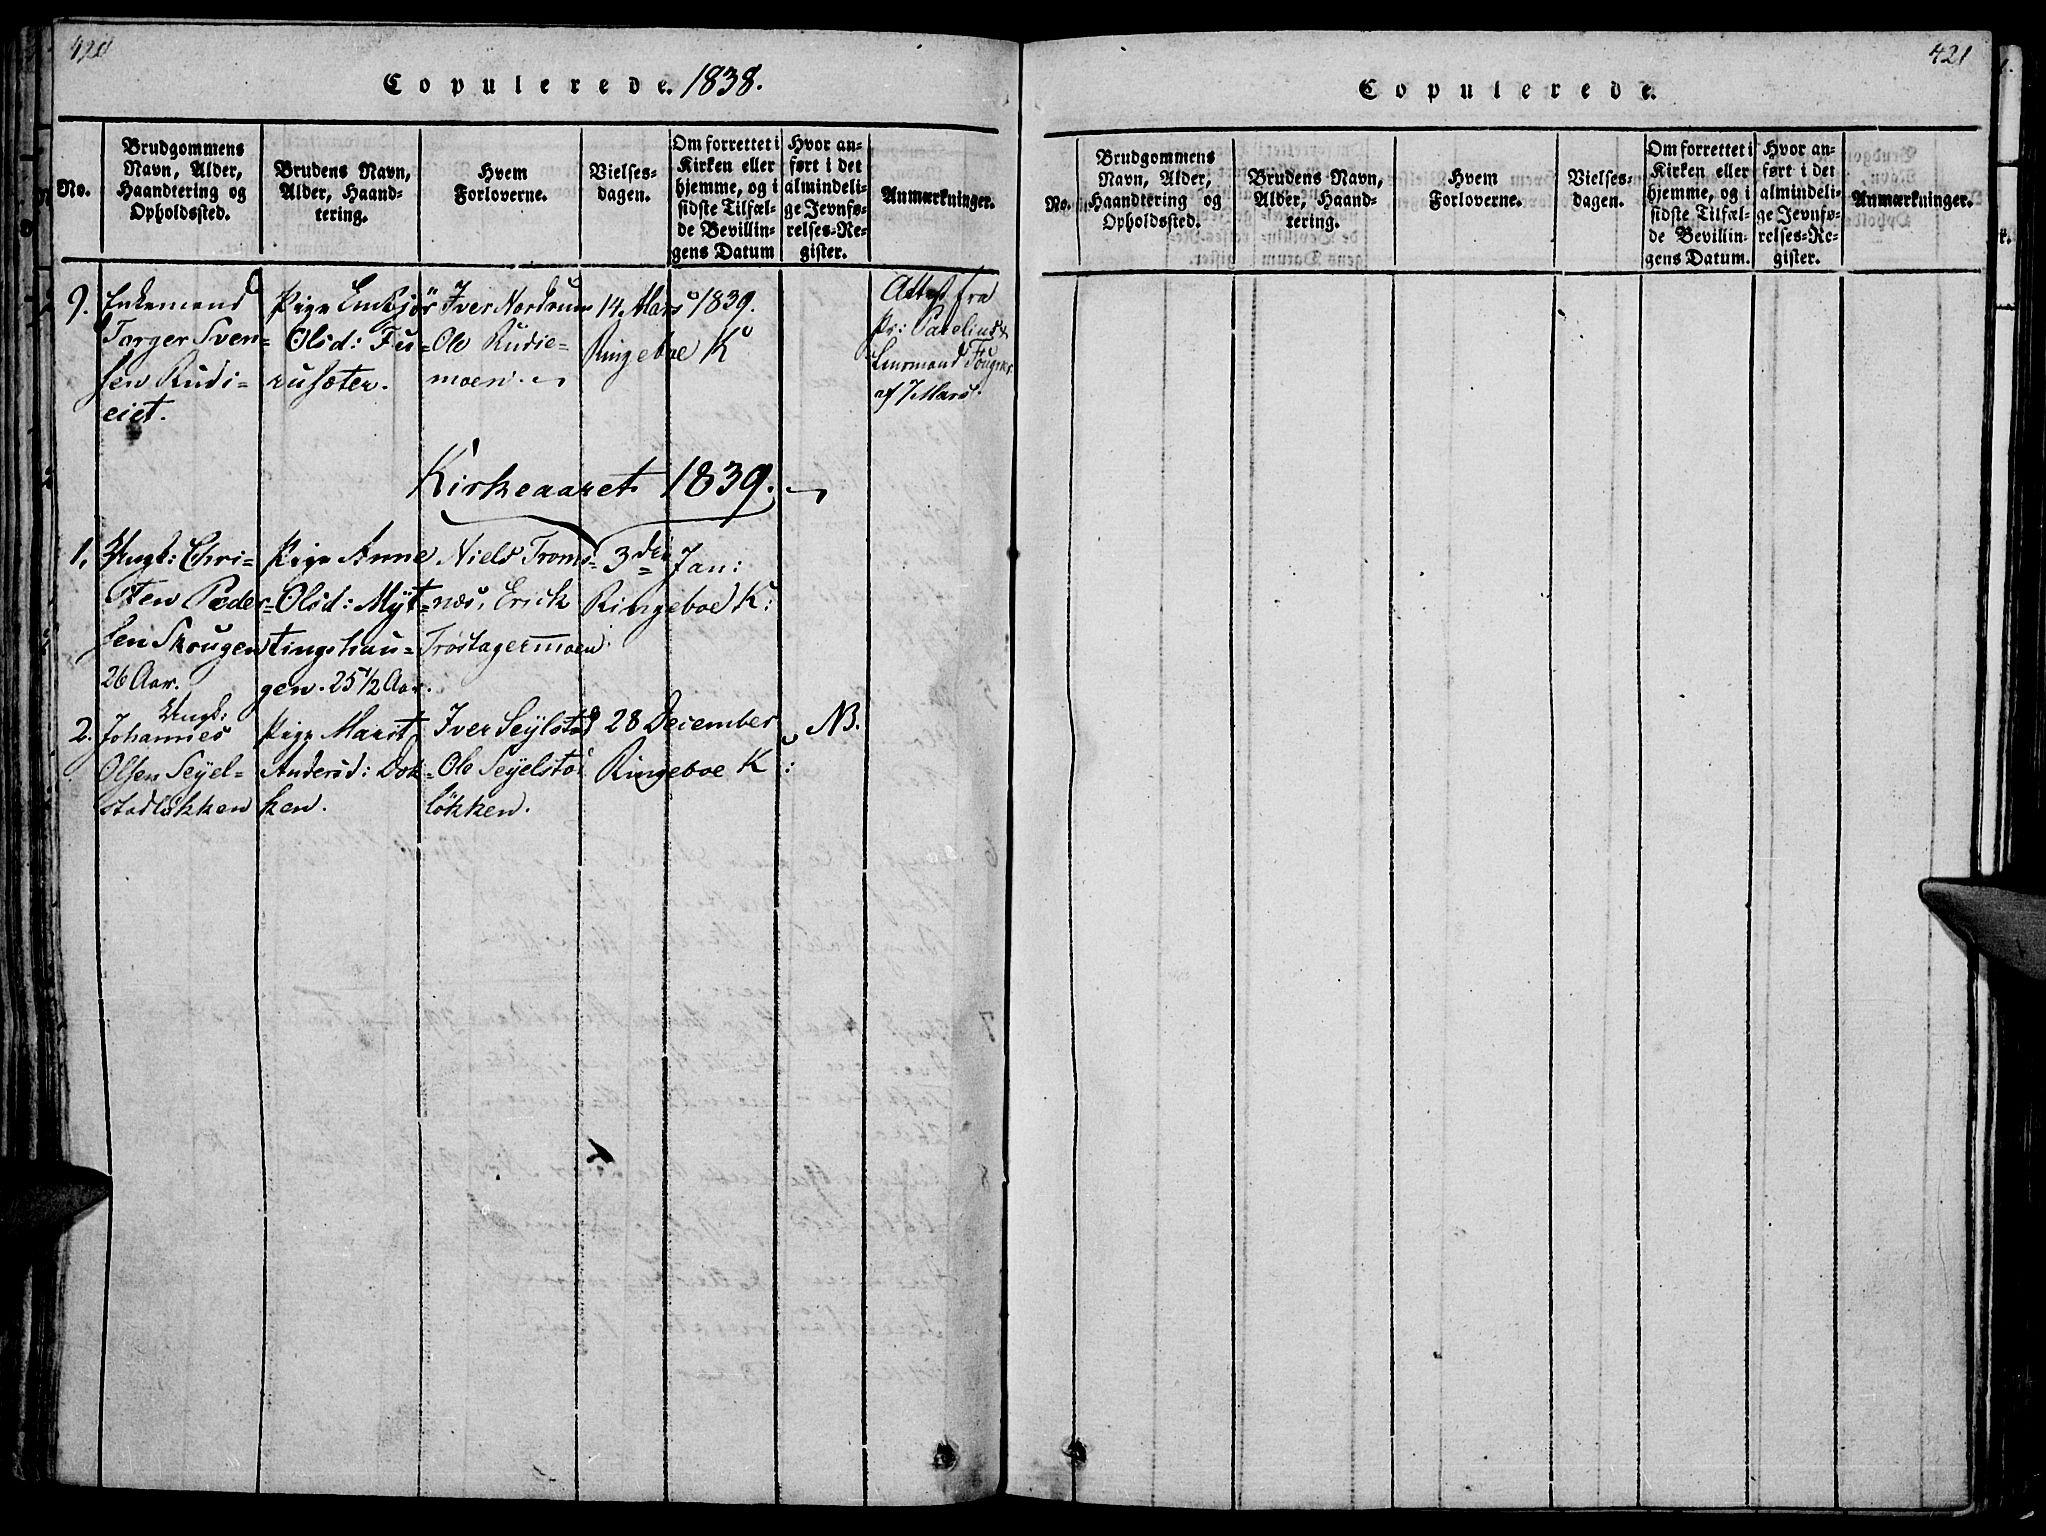 SAH, Ringebu prestekontor, Ministerialbok nr. 4, 1821-1839, s. 420-421